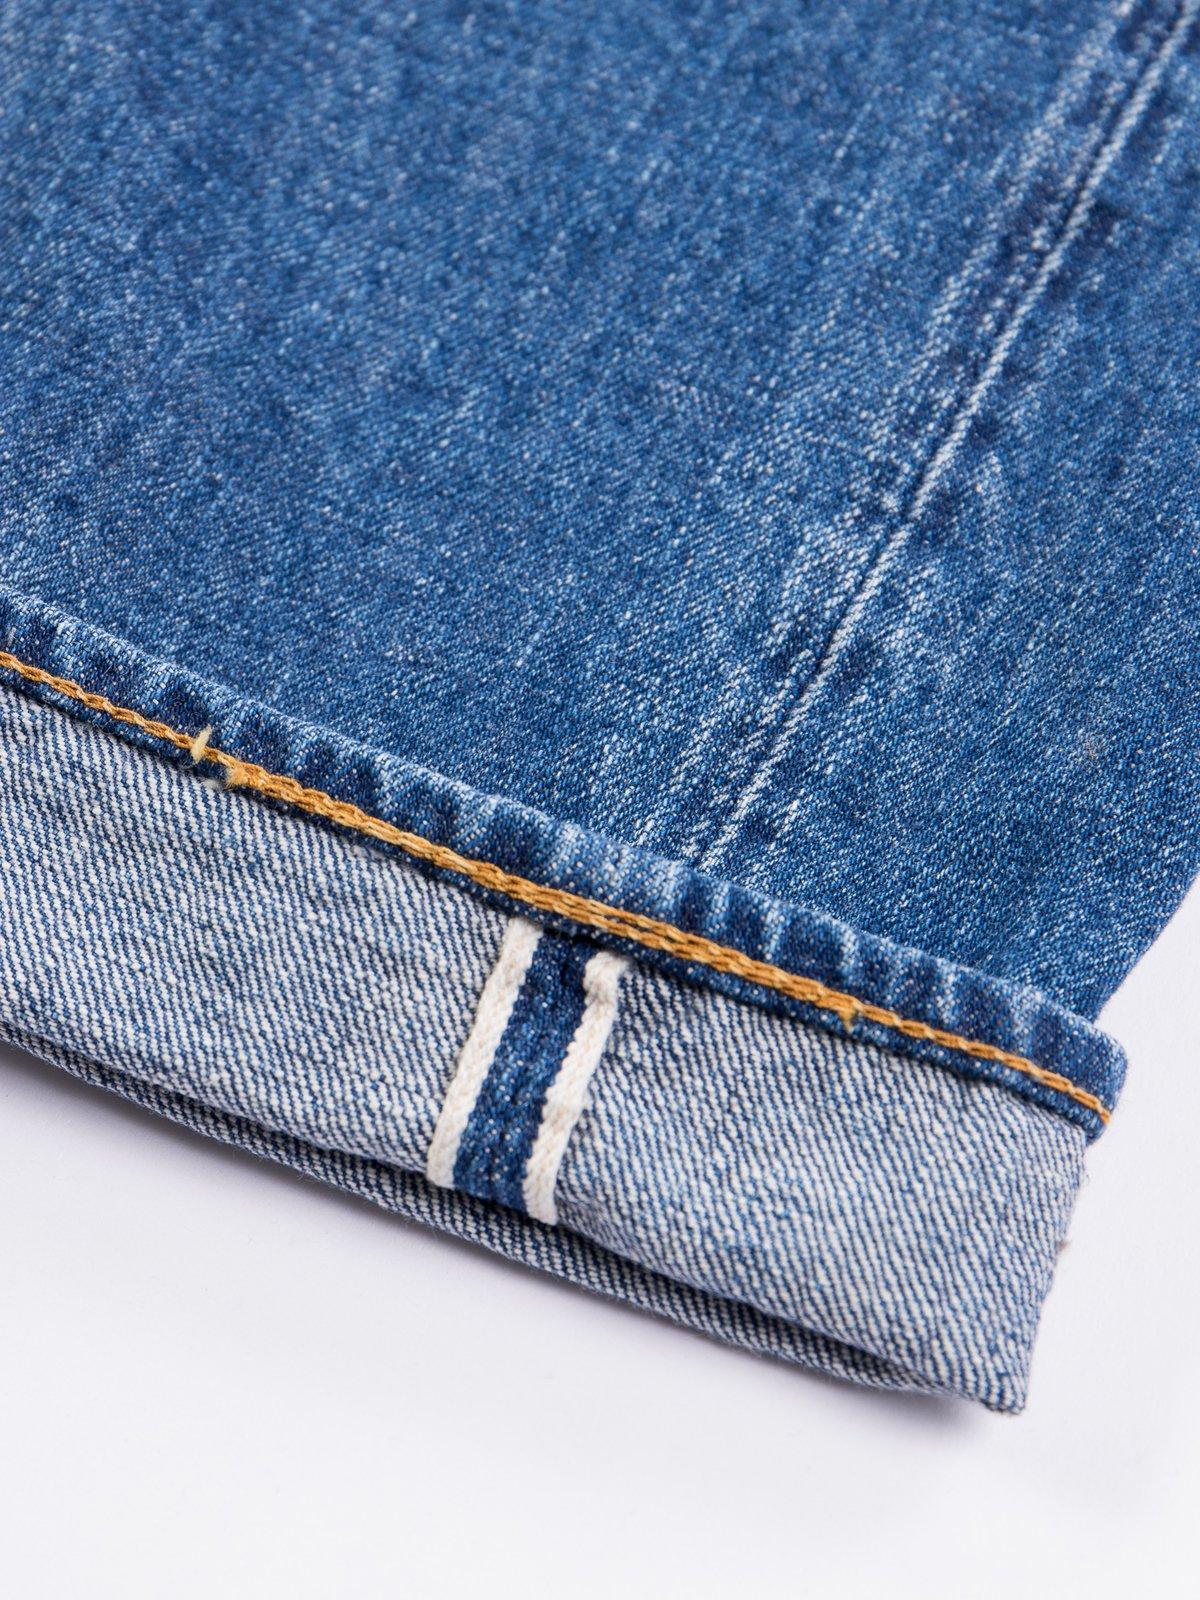 2 Year Wash 107 Slim Fit Jean - Image 5